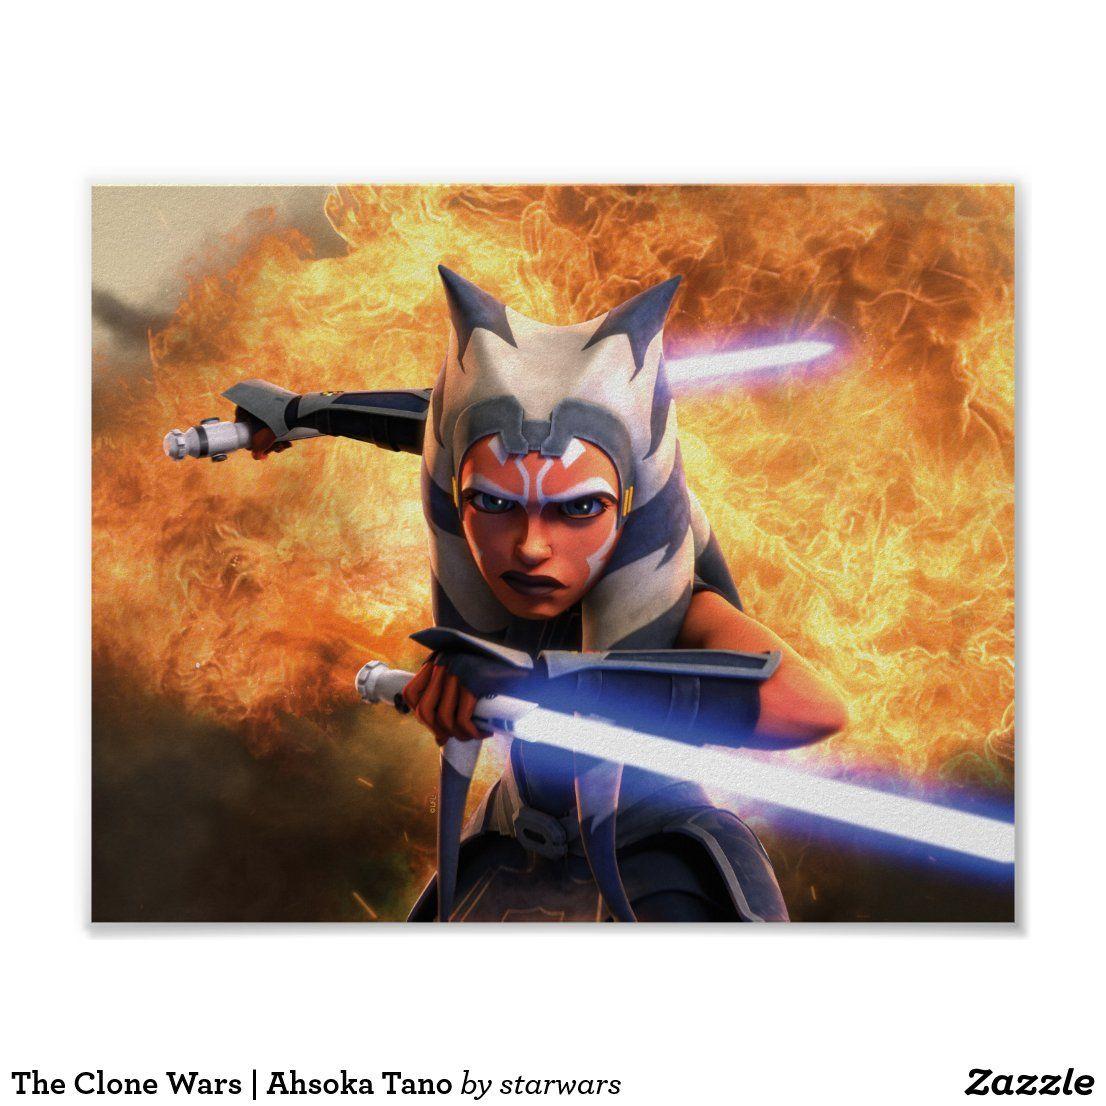 The Clone Wars Ahsoka Tano Poster Zazzle Com Star Wars Art Star Wars Poster Clone Wars Ahsoka